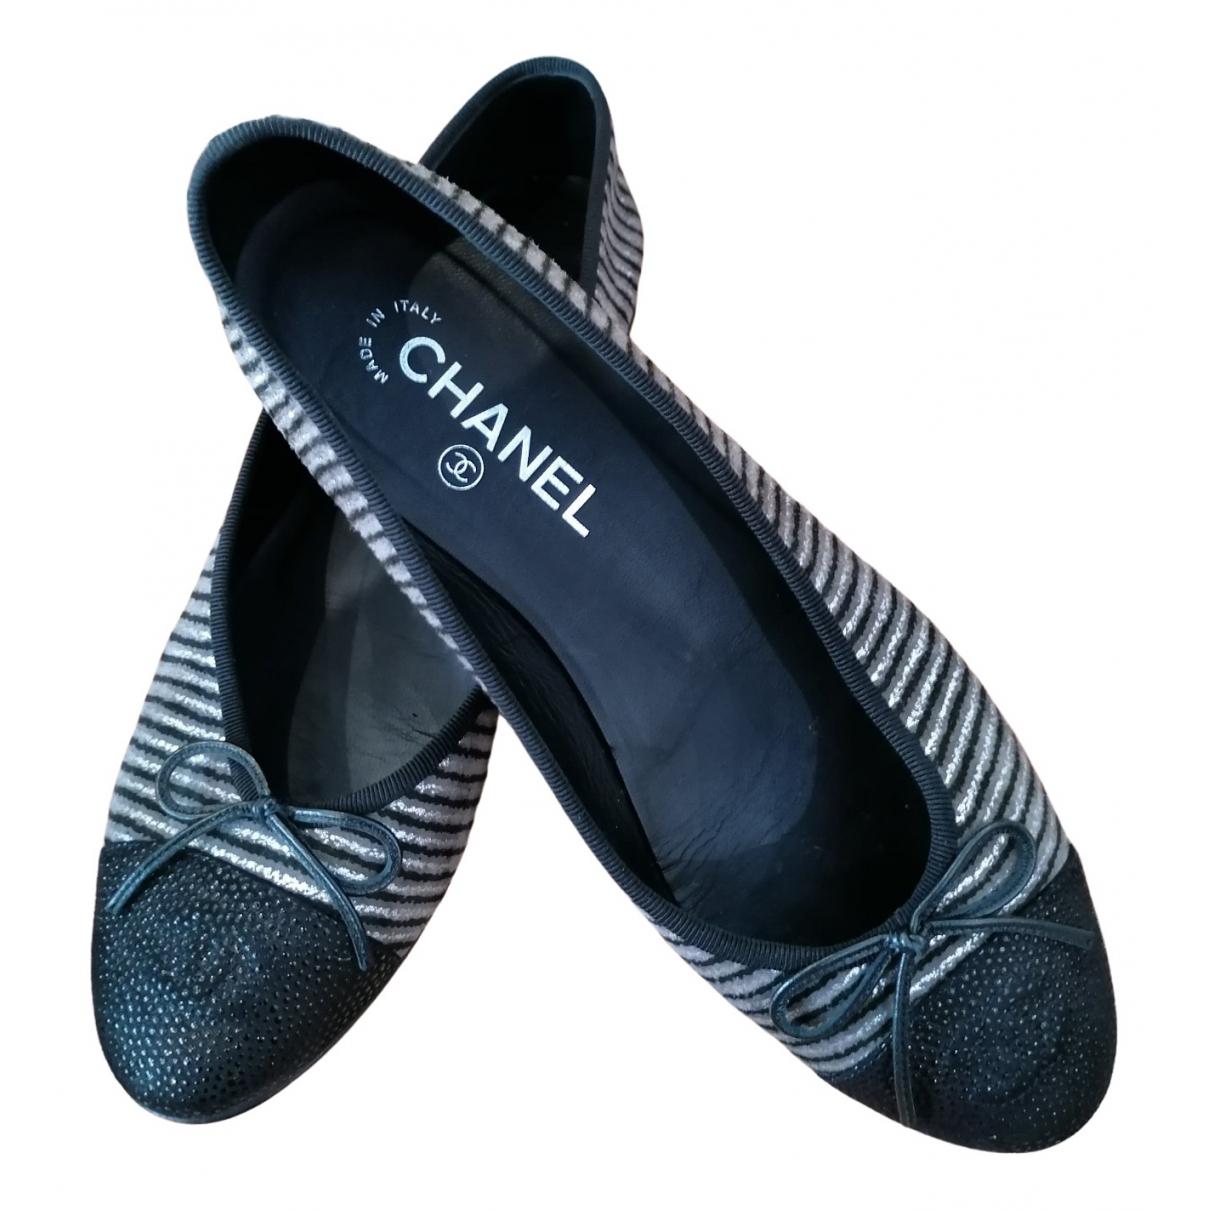 Chanel \N Black Leather Ballet flats for Women 39 EU